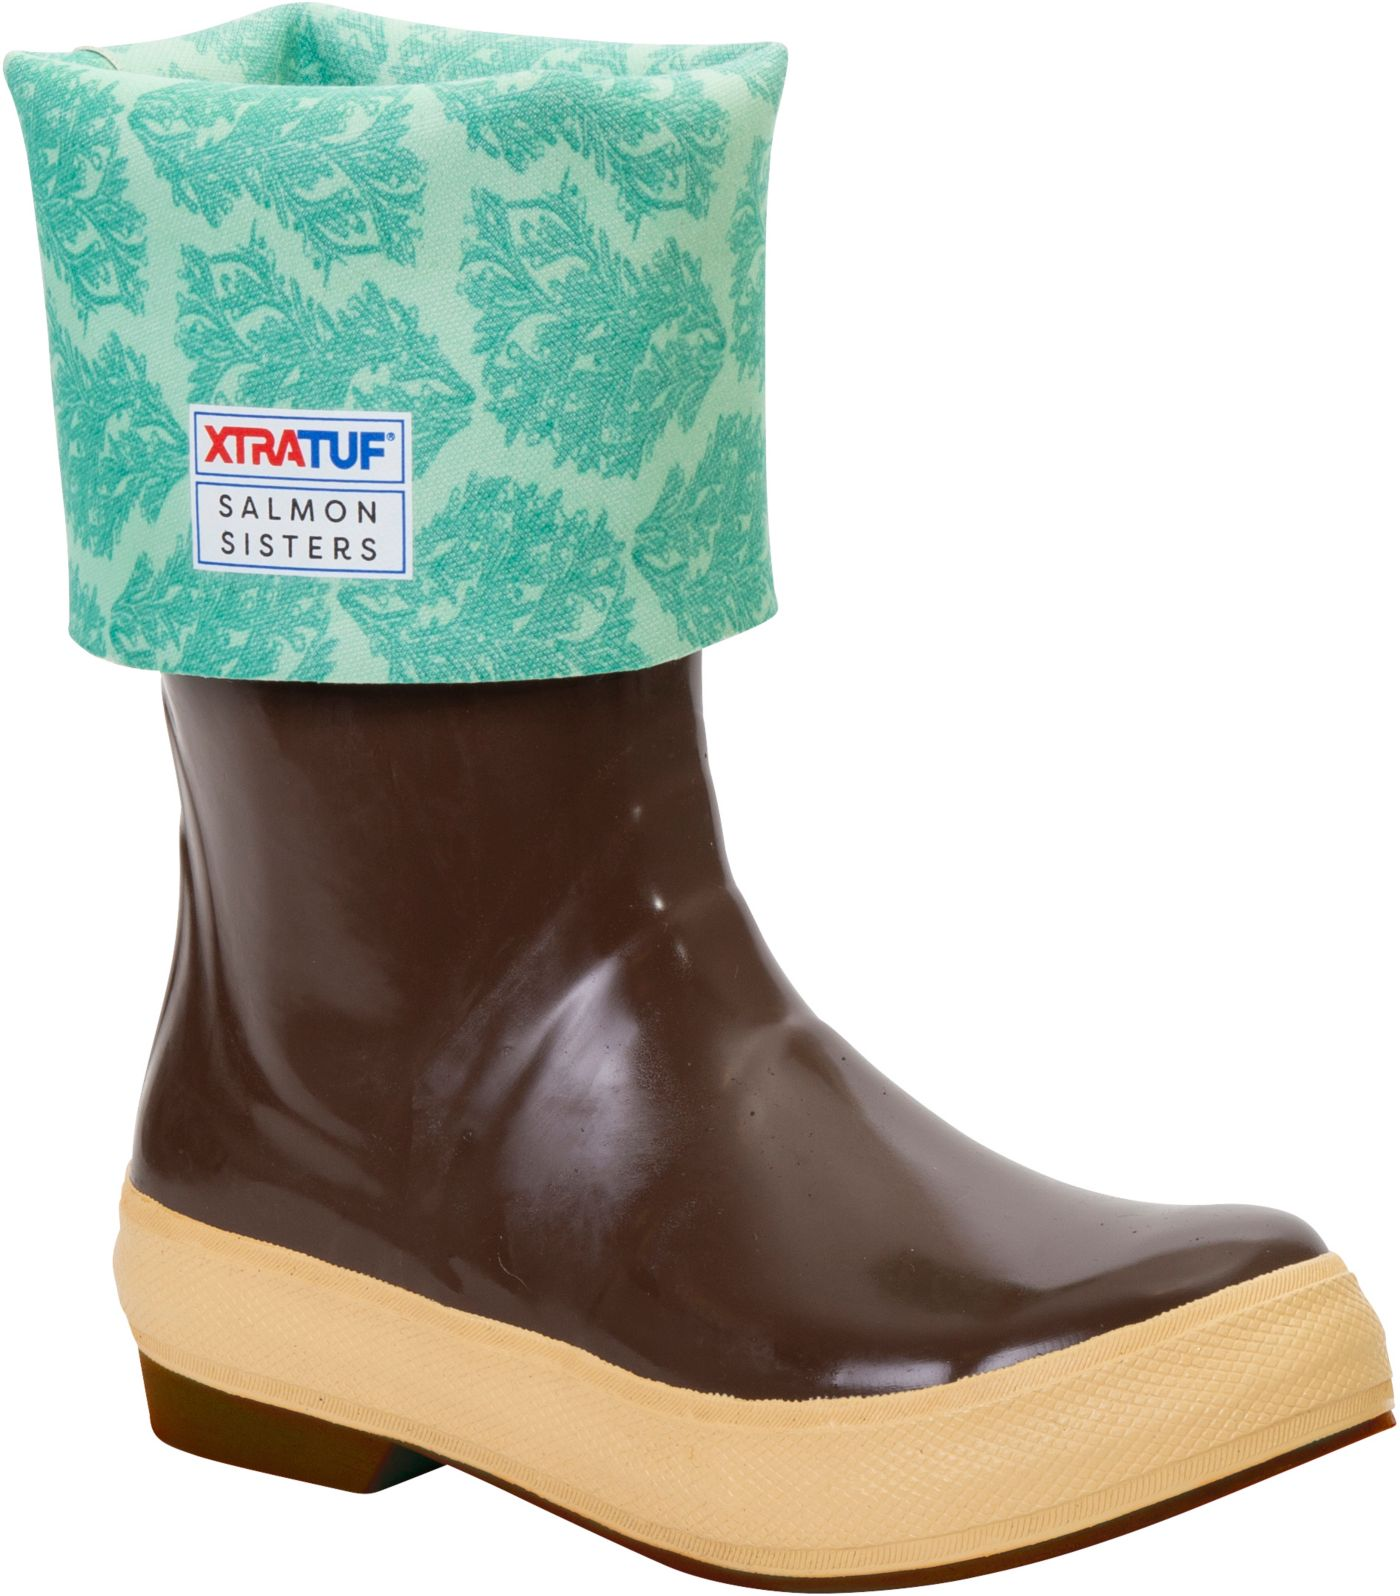 XTRATUF Women's Salmon Sisters 15'' Legacy Rubber Boots